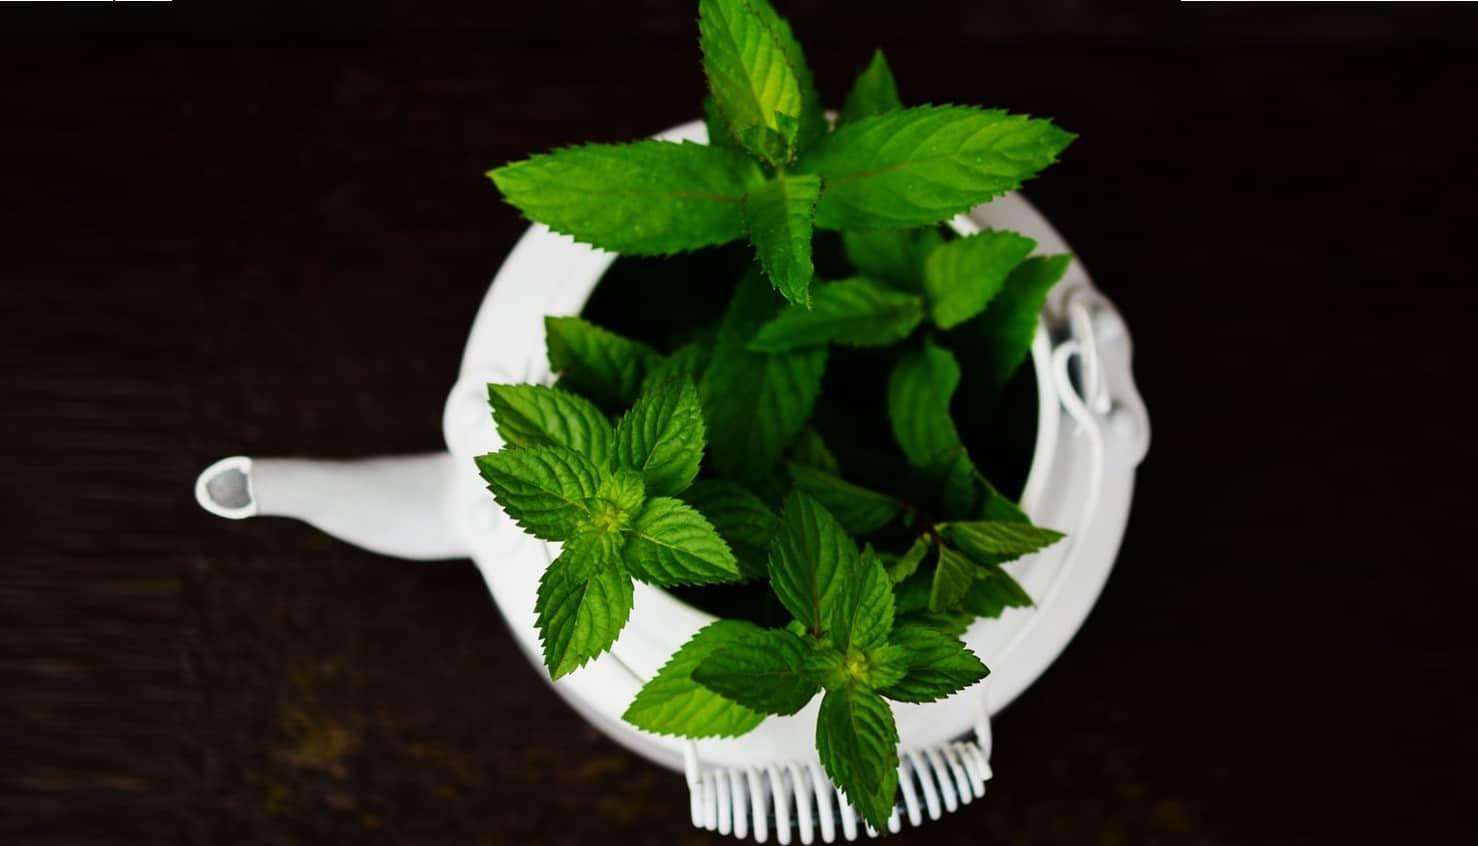 seven-stress-relief-plants-1-peppermint